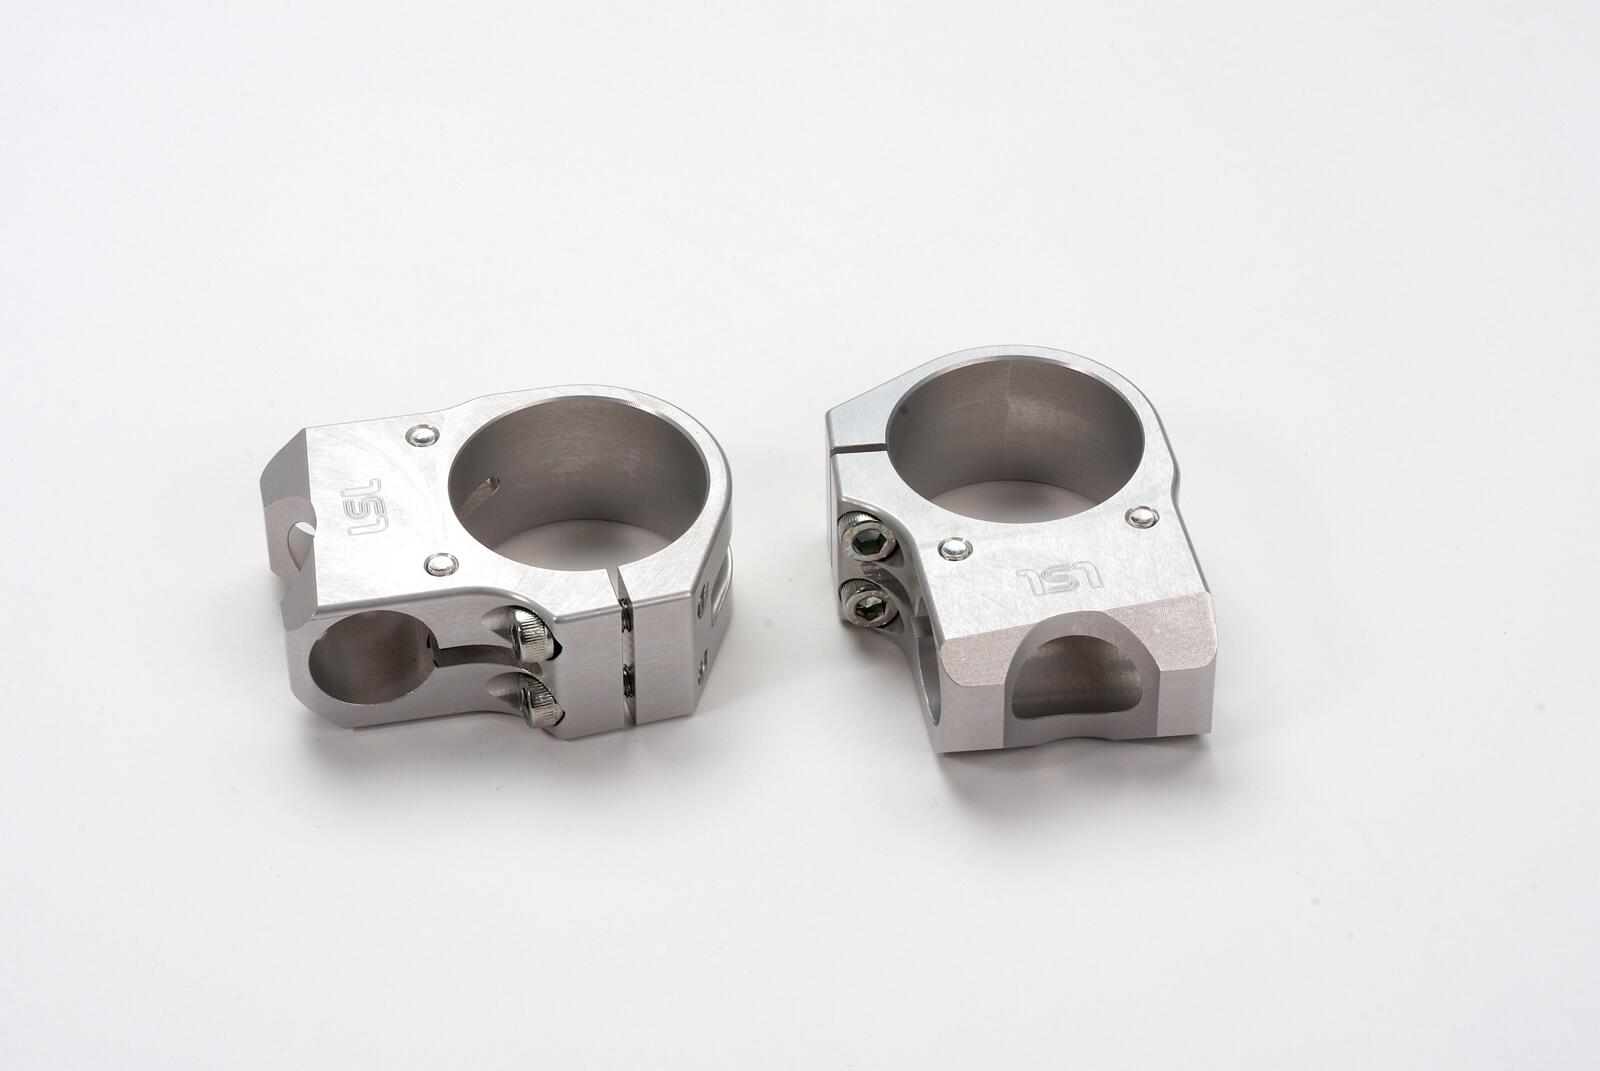 Abrazaderas seminanillar sport LSL diámetro de 51 mm